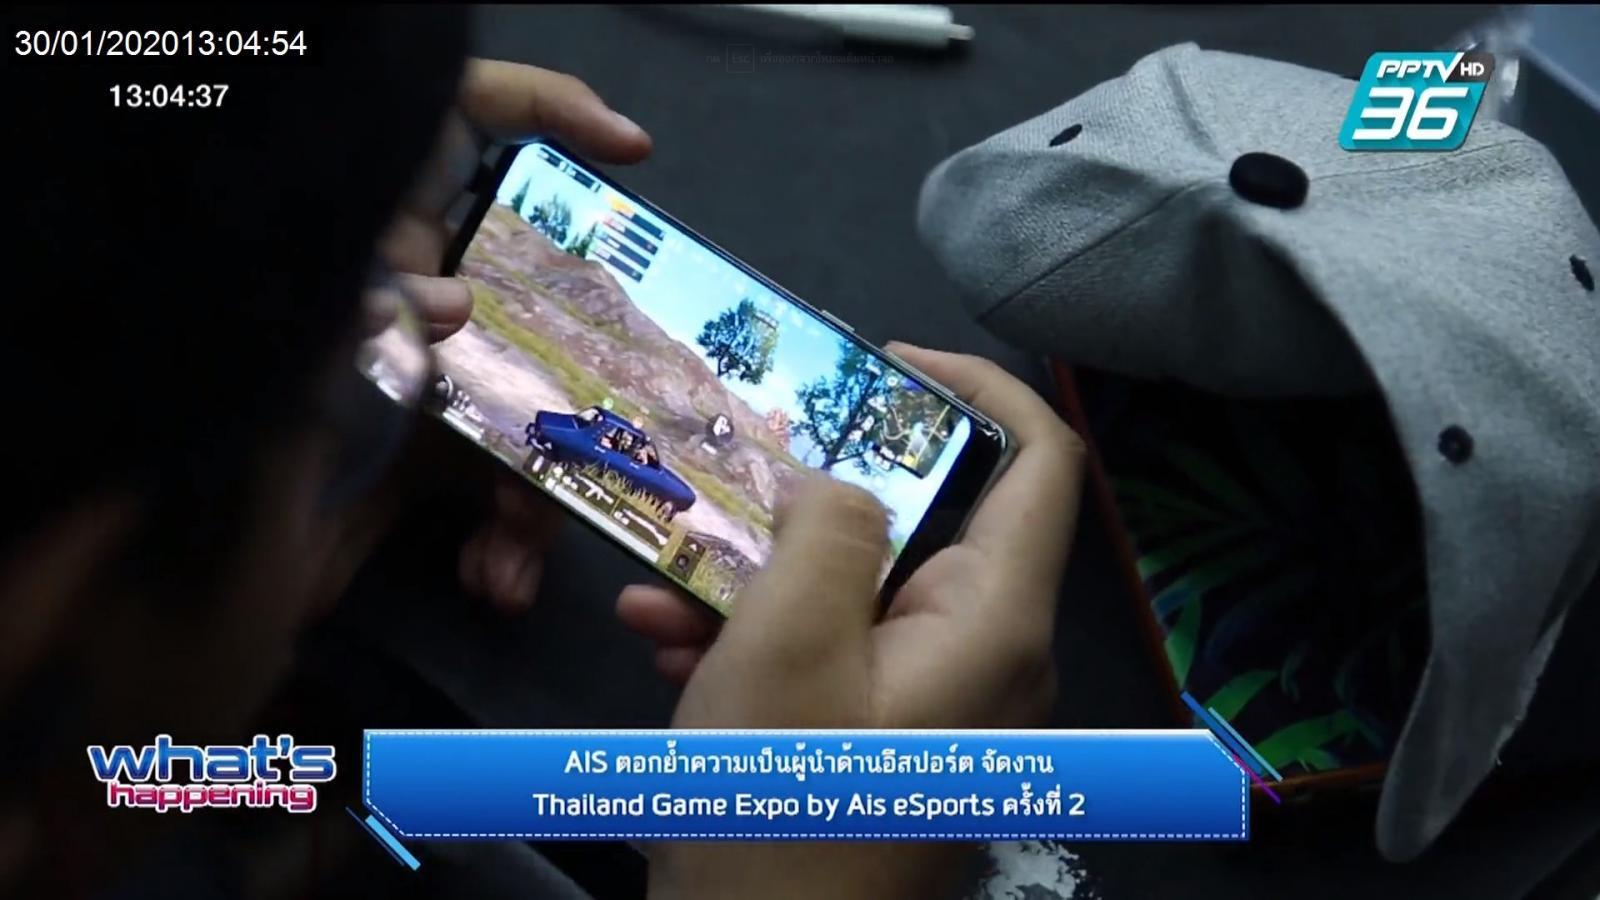 "AIS ""Thailand Game Expo by AIS eSports ครั้งที่ 2 30 ม.ค. - 2 ก.พ.63"""